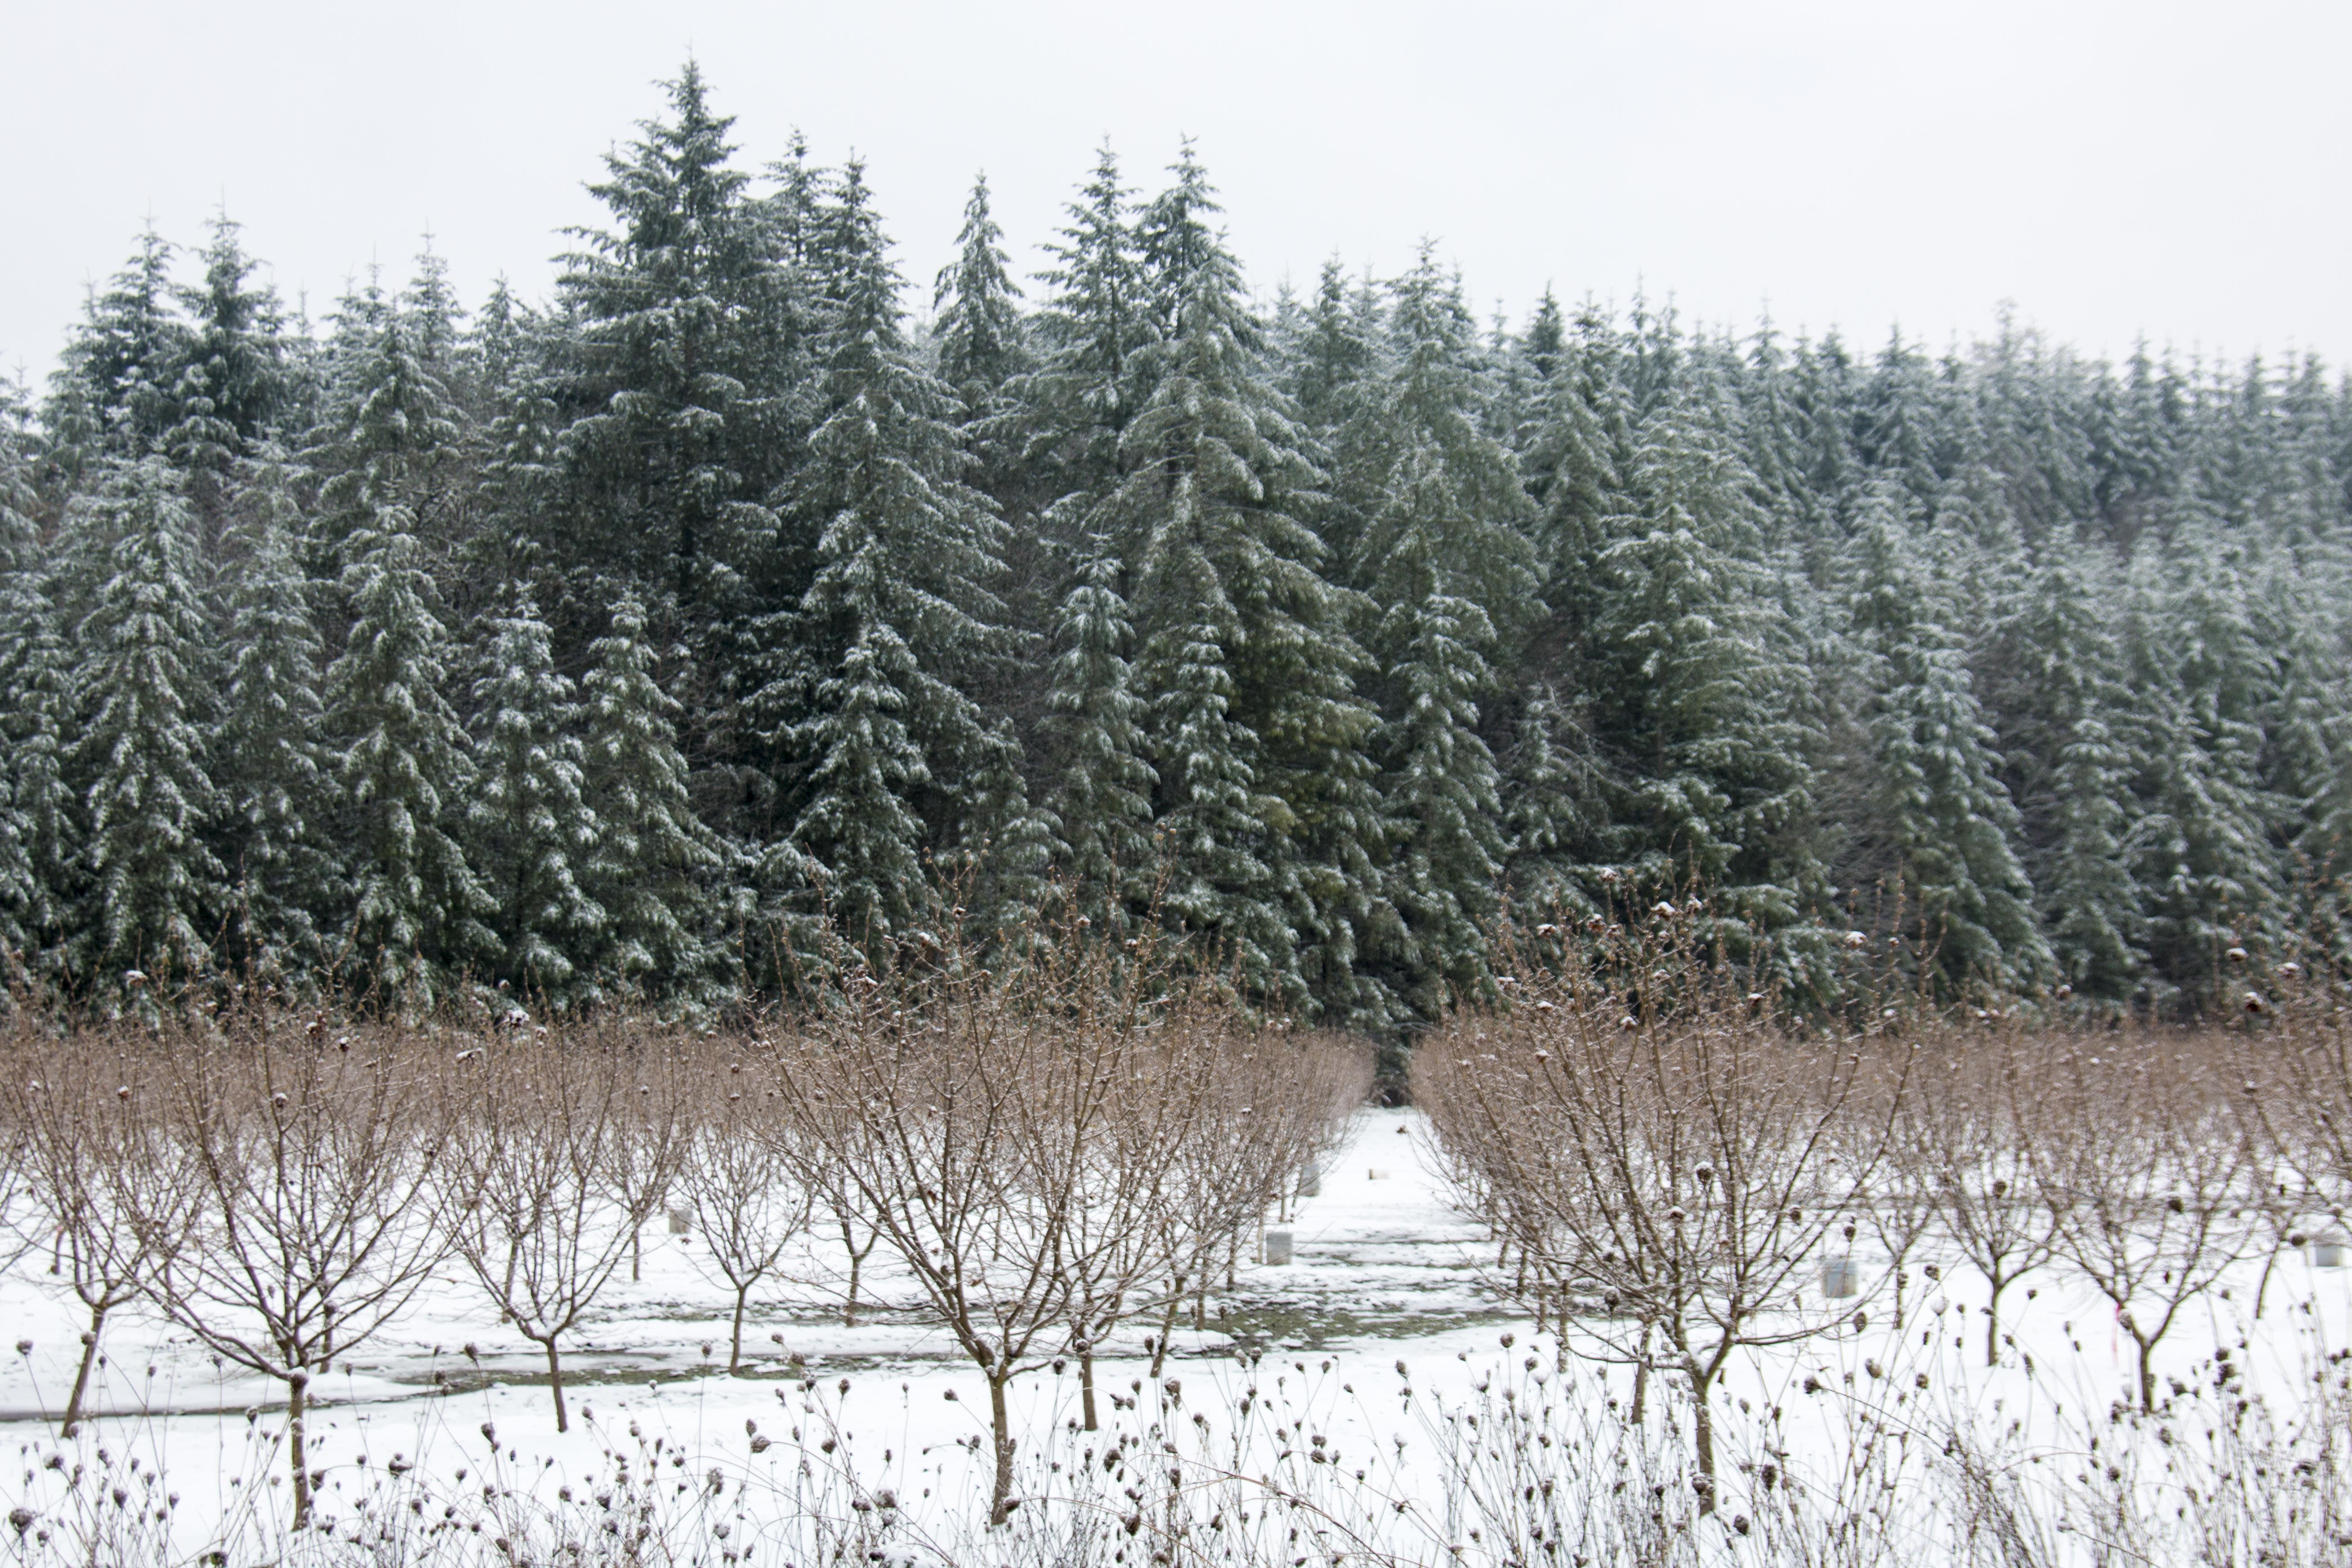 Snow on the hazel nut trees, oregon photo